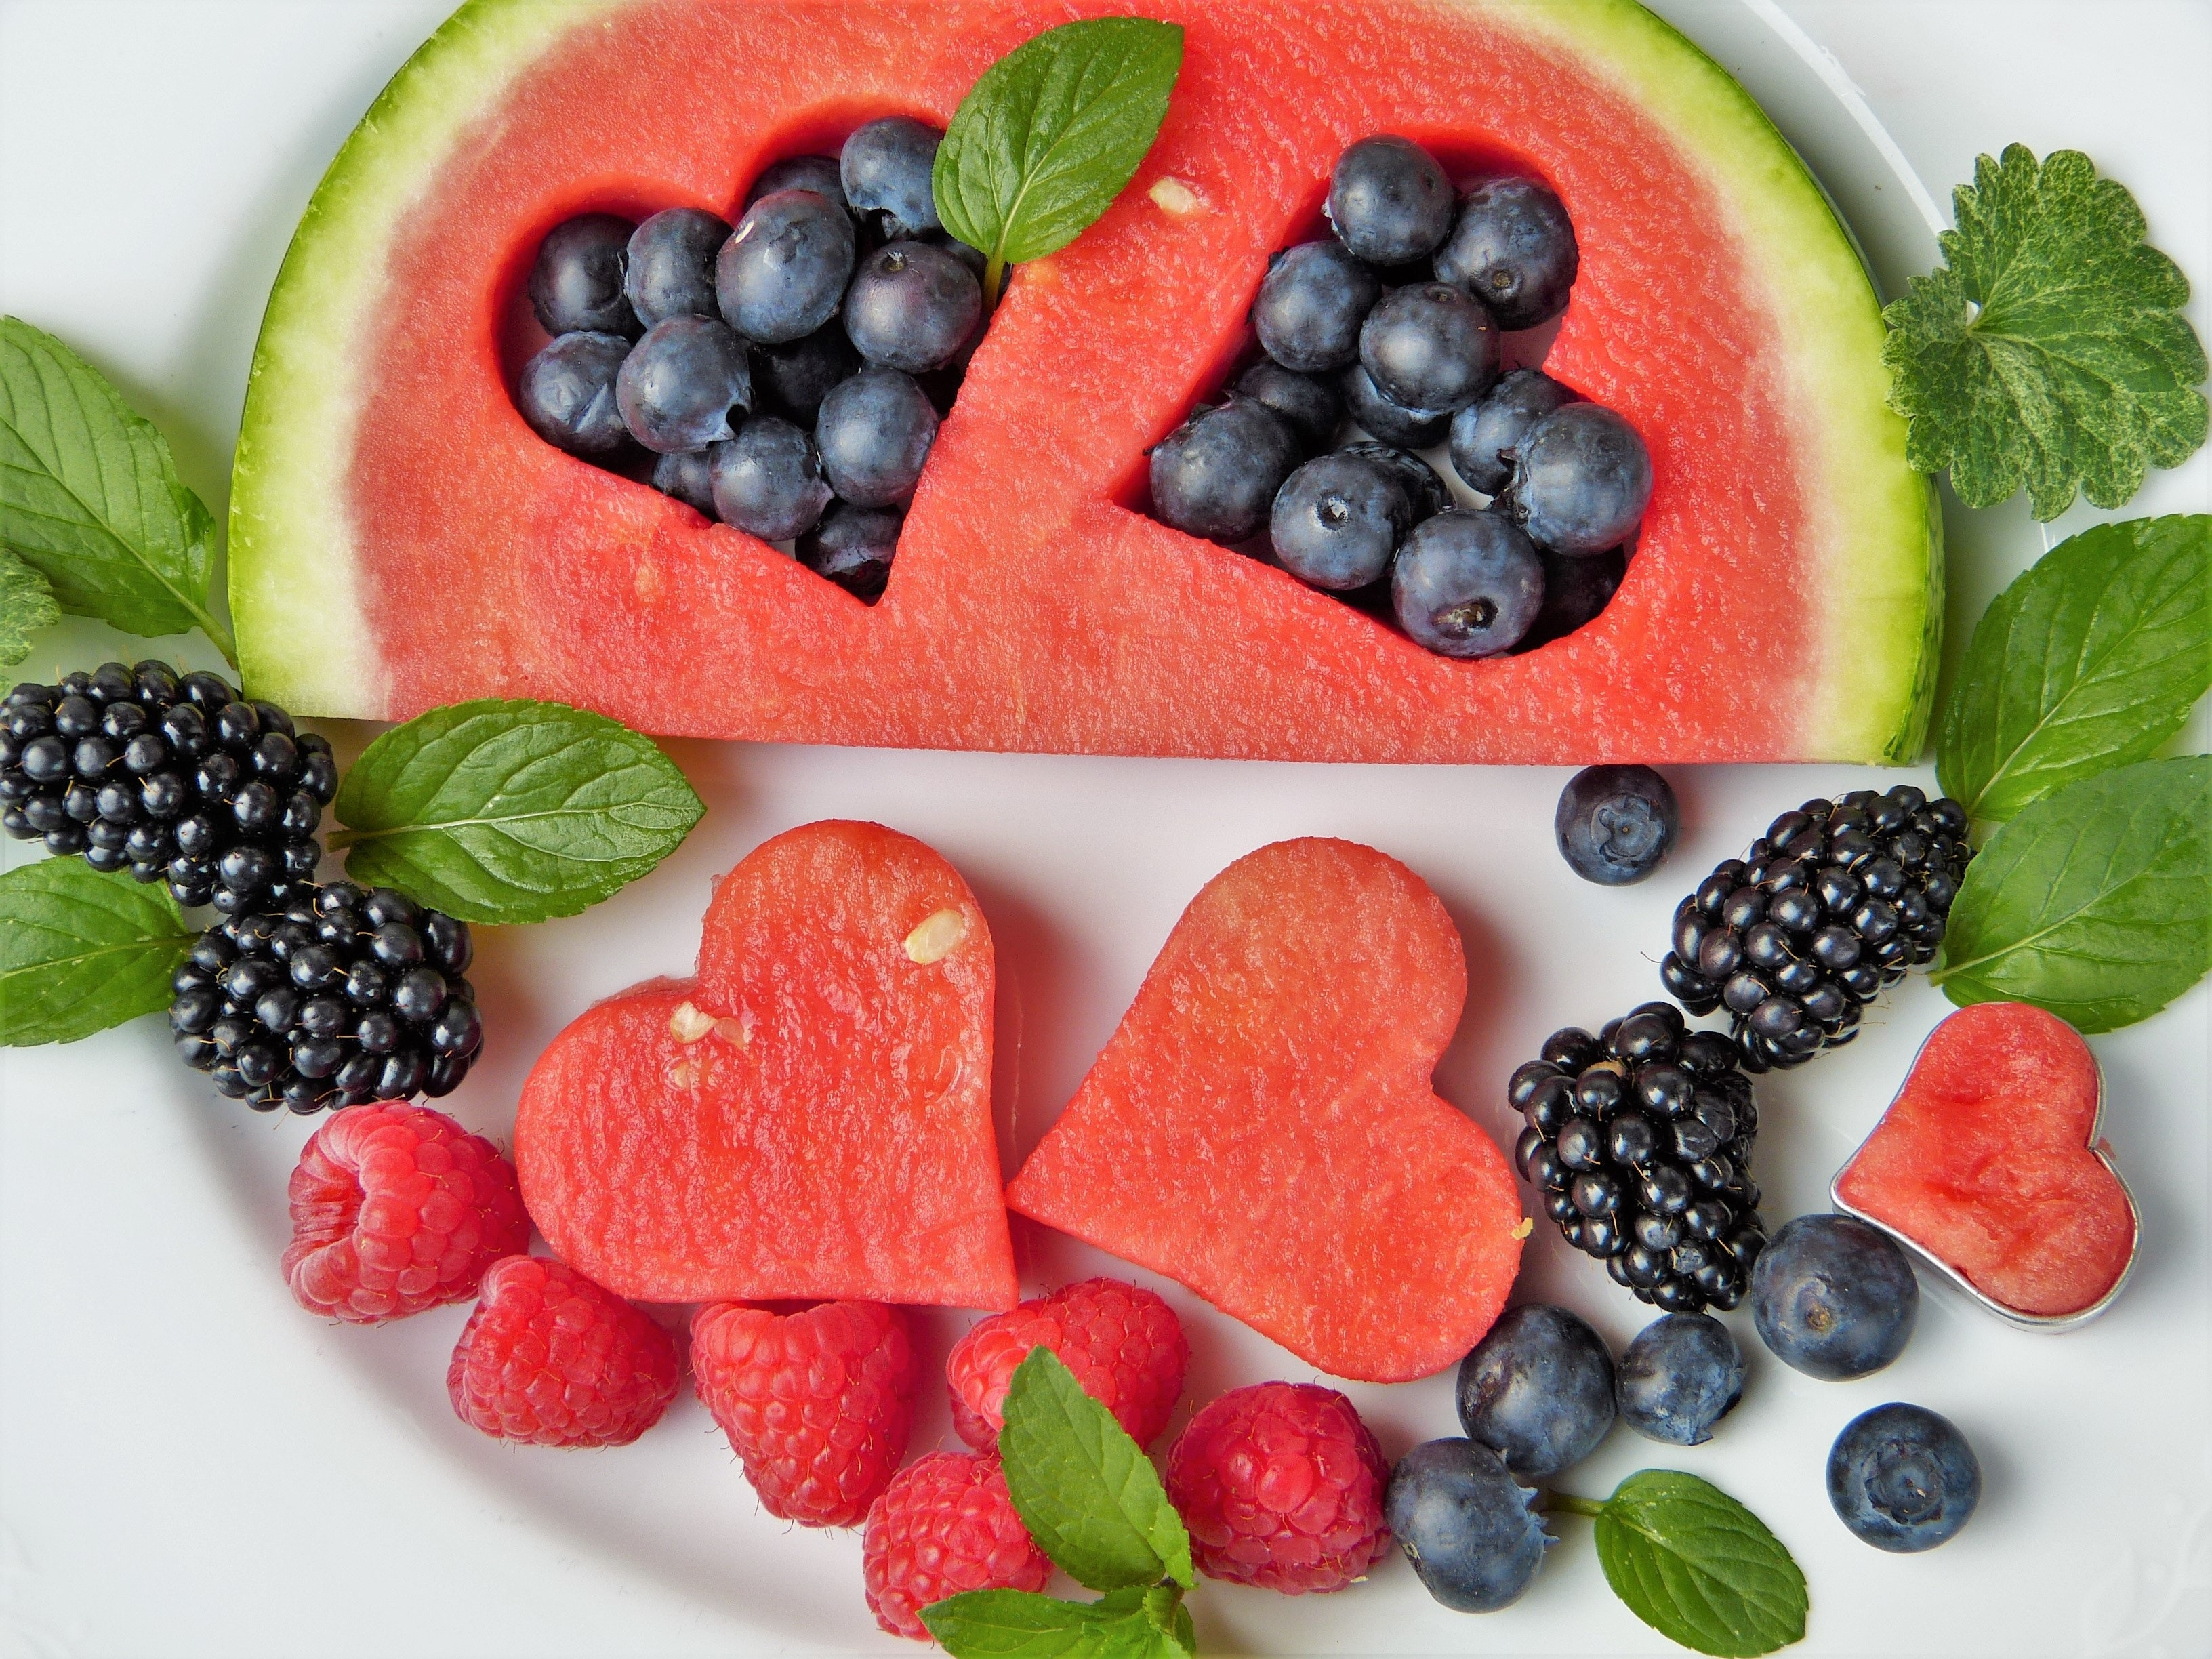 free stock photos of fruits · pexels